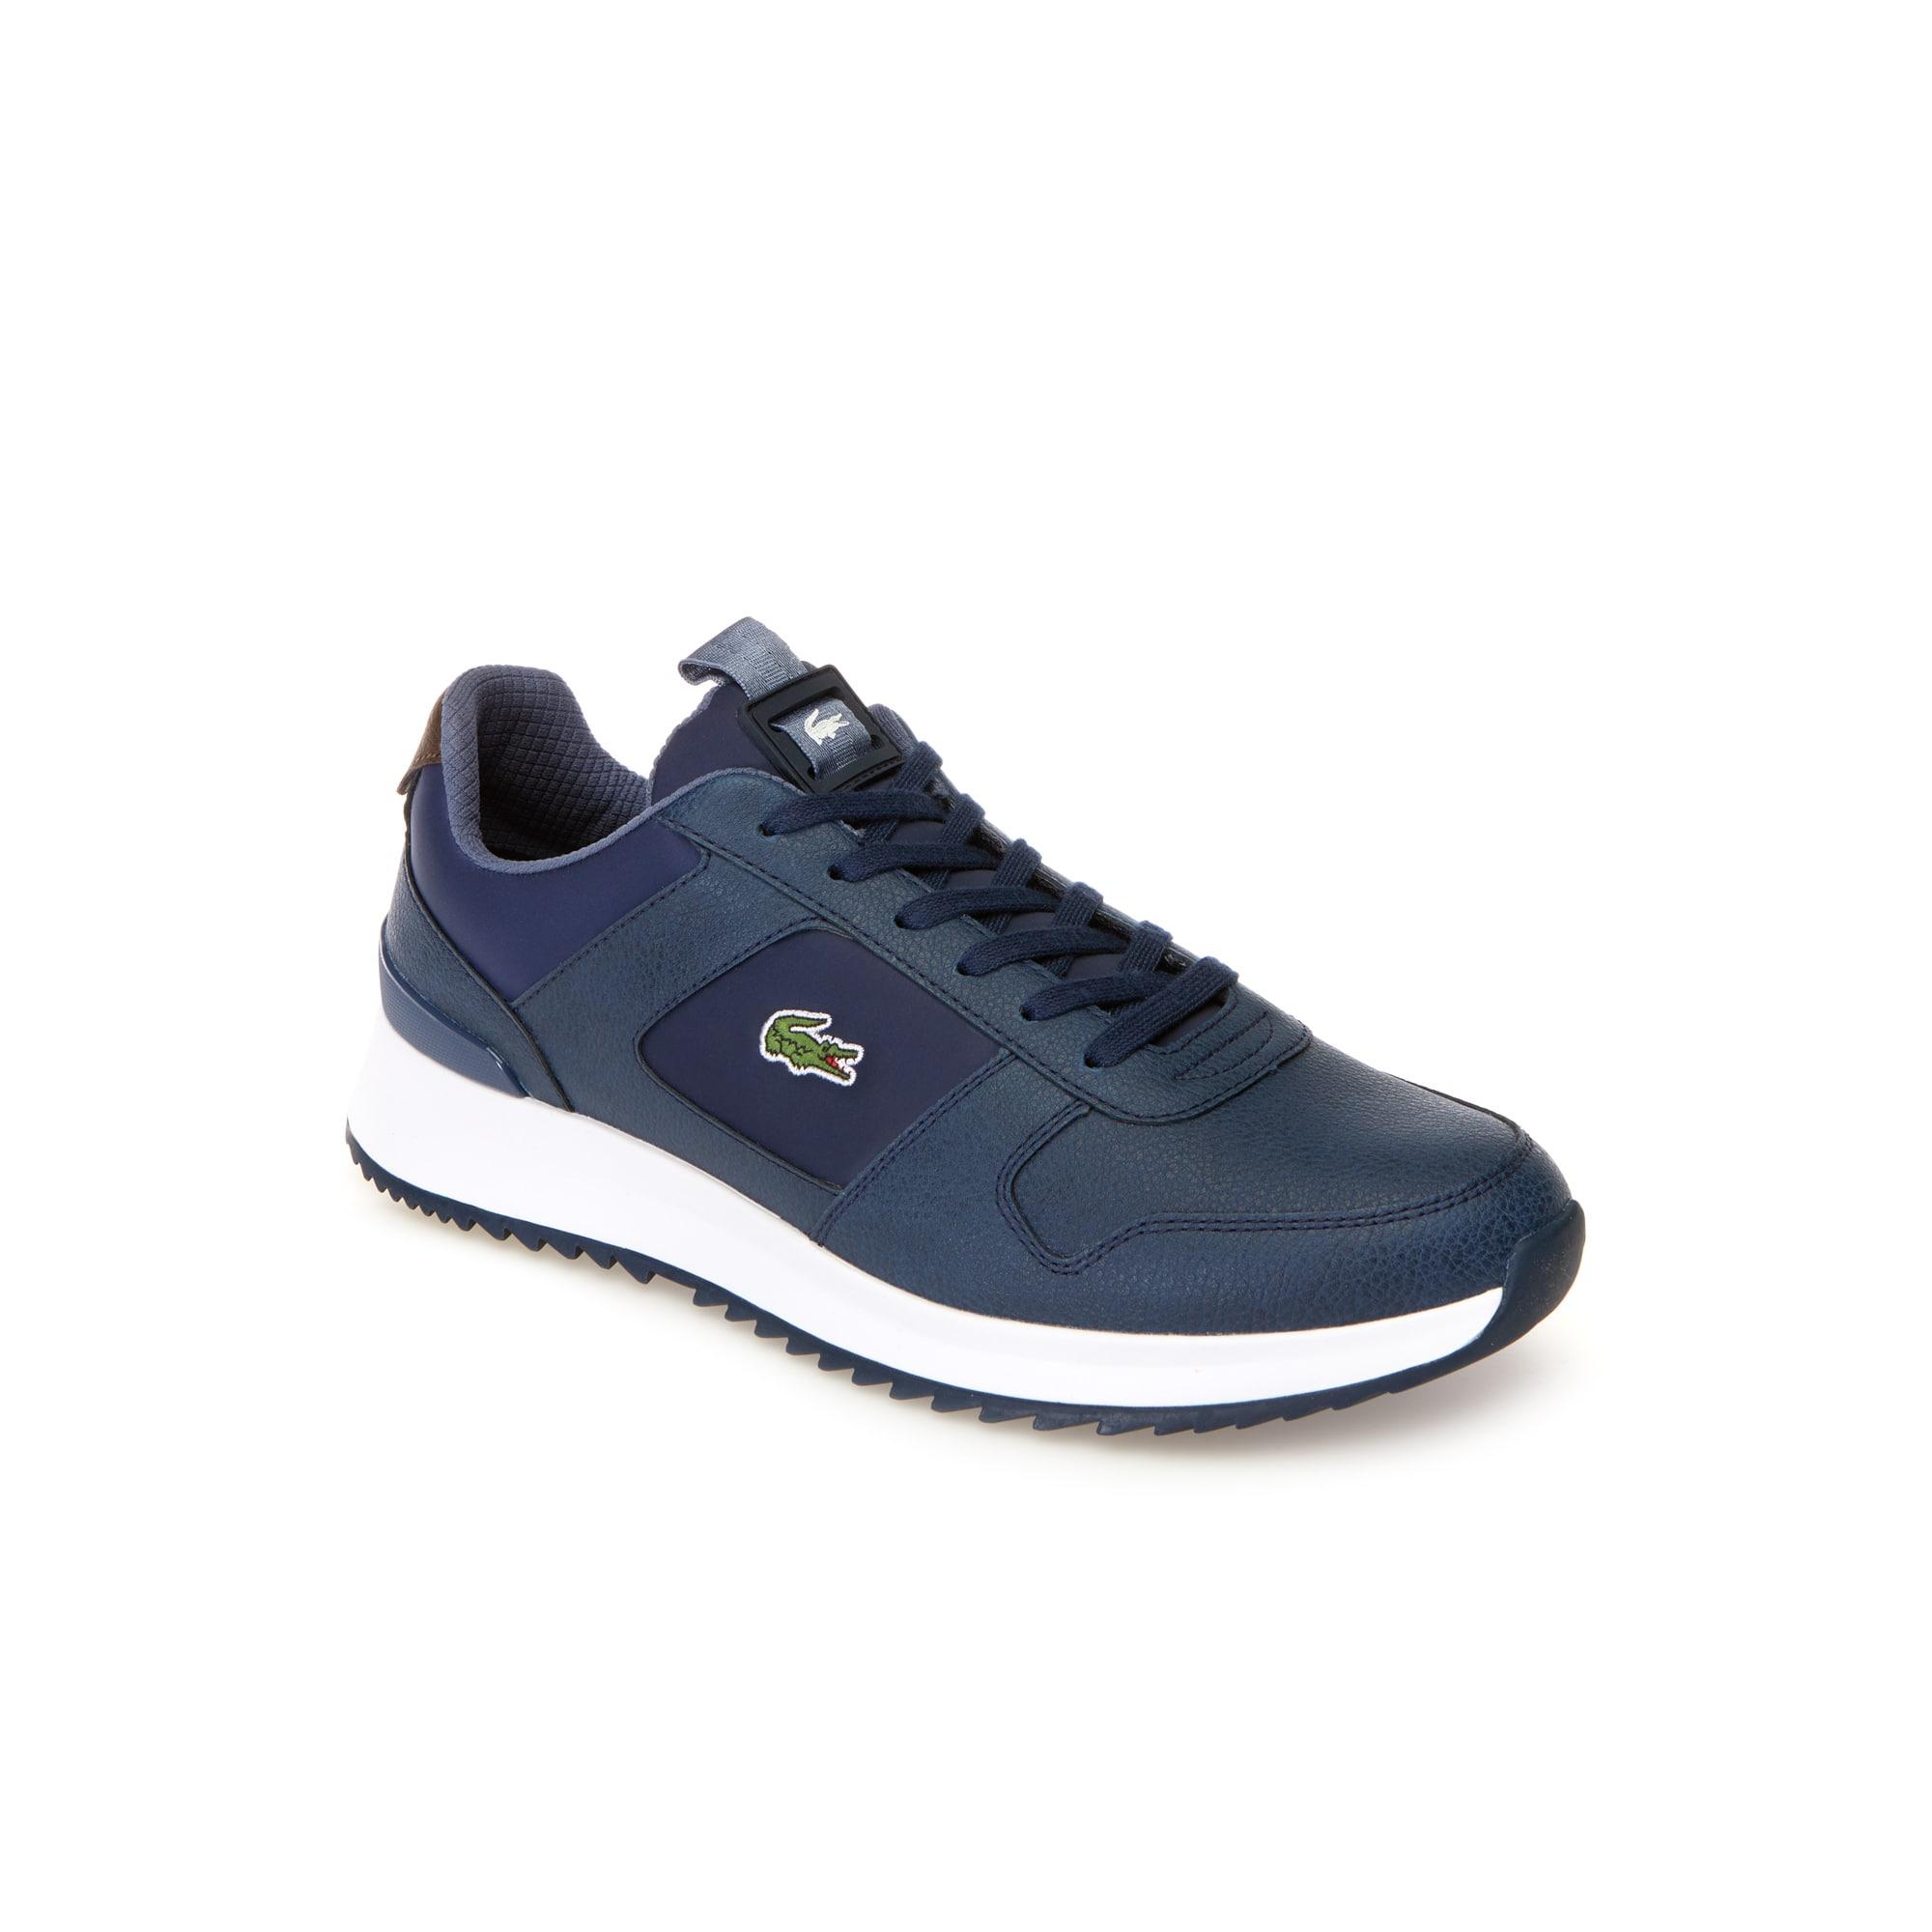 c825a59815e Calçados masculinos Lacoste  Sneakers